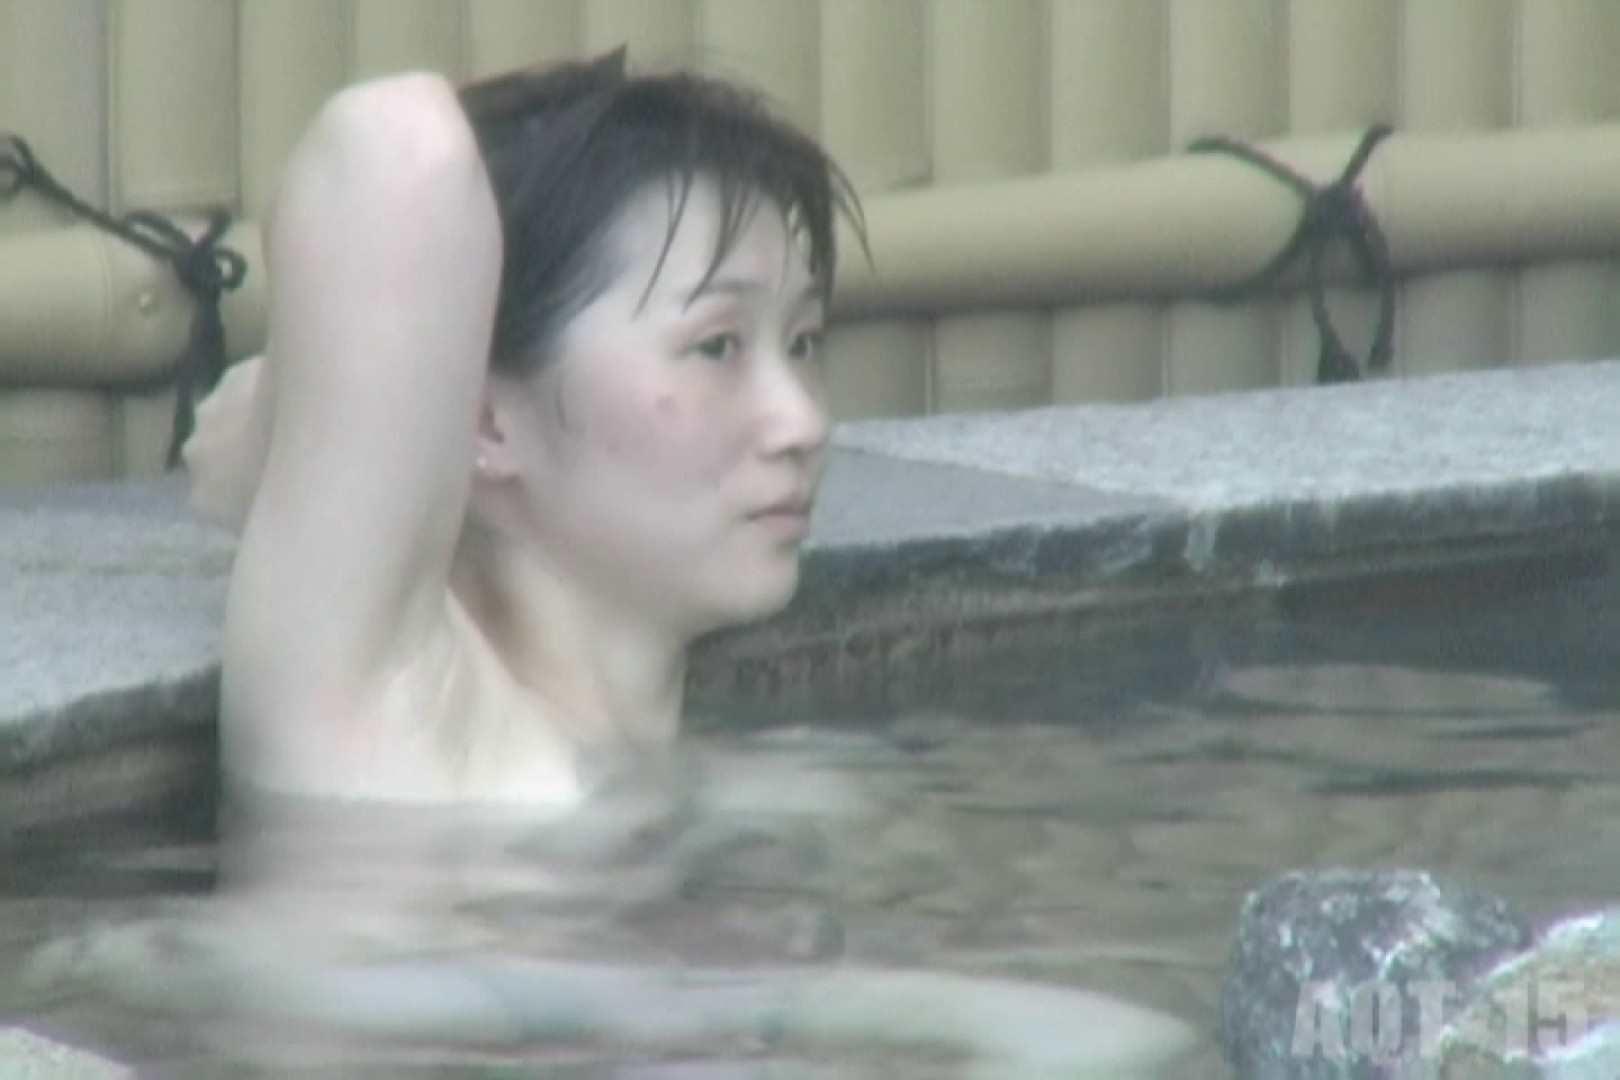 Aquaな露天風呂Vol.831 露天   HなOL  99pic 77